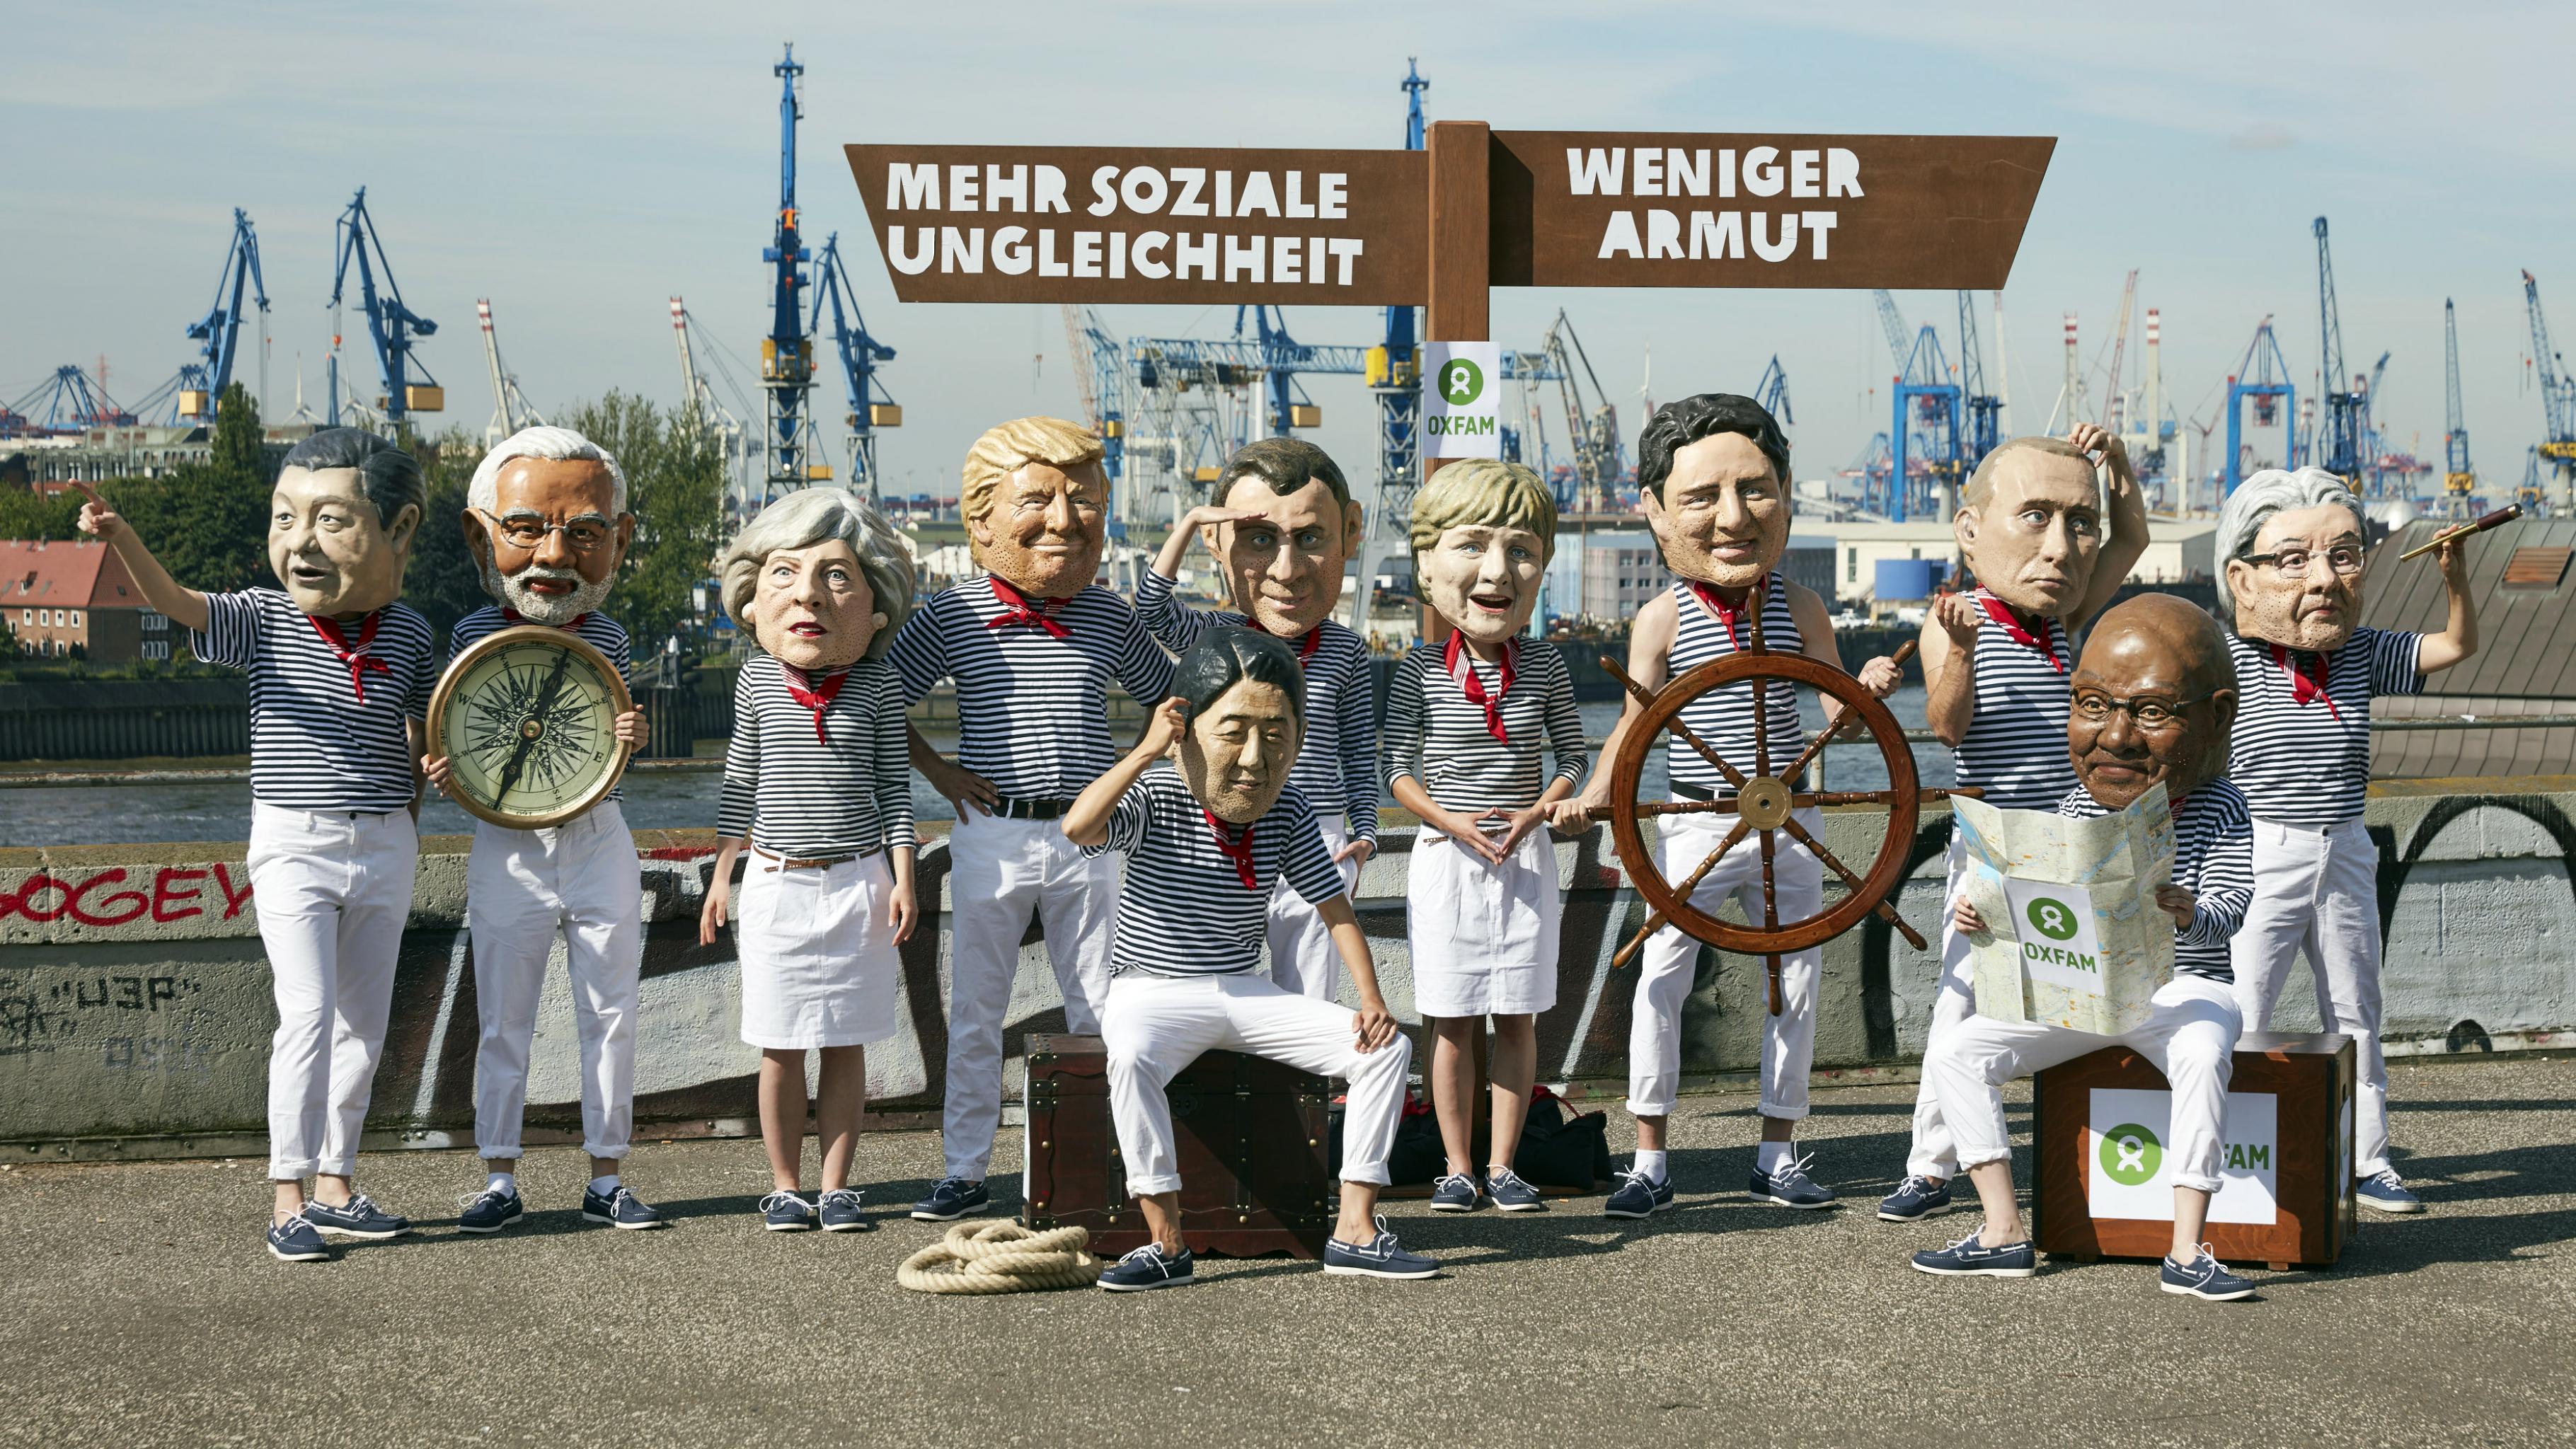 Oxfam G20 Photostunt